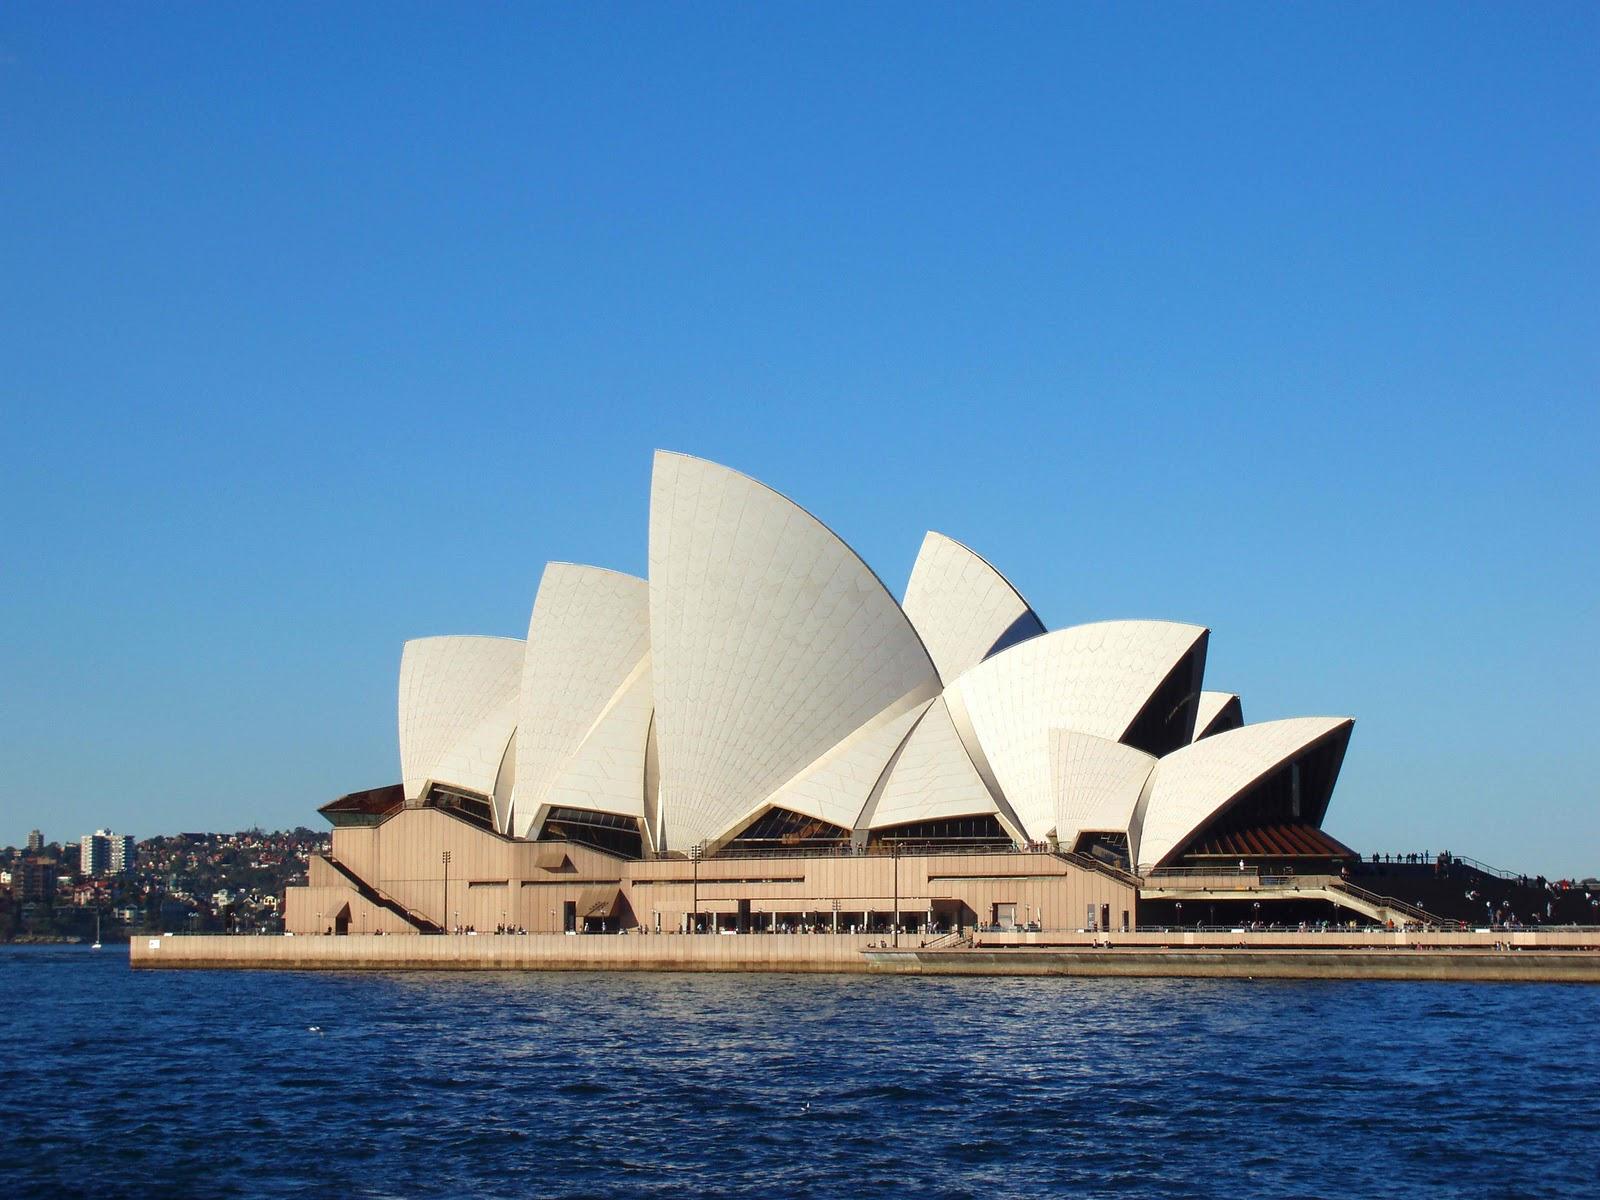 Airline Travel Deals  Travel Tips  Travel News Sydney's